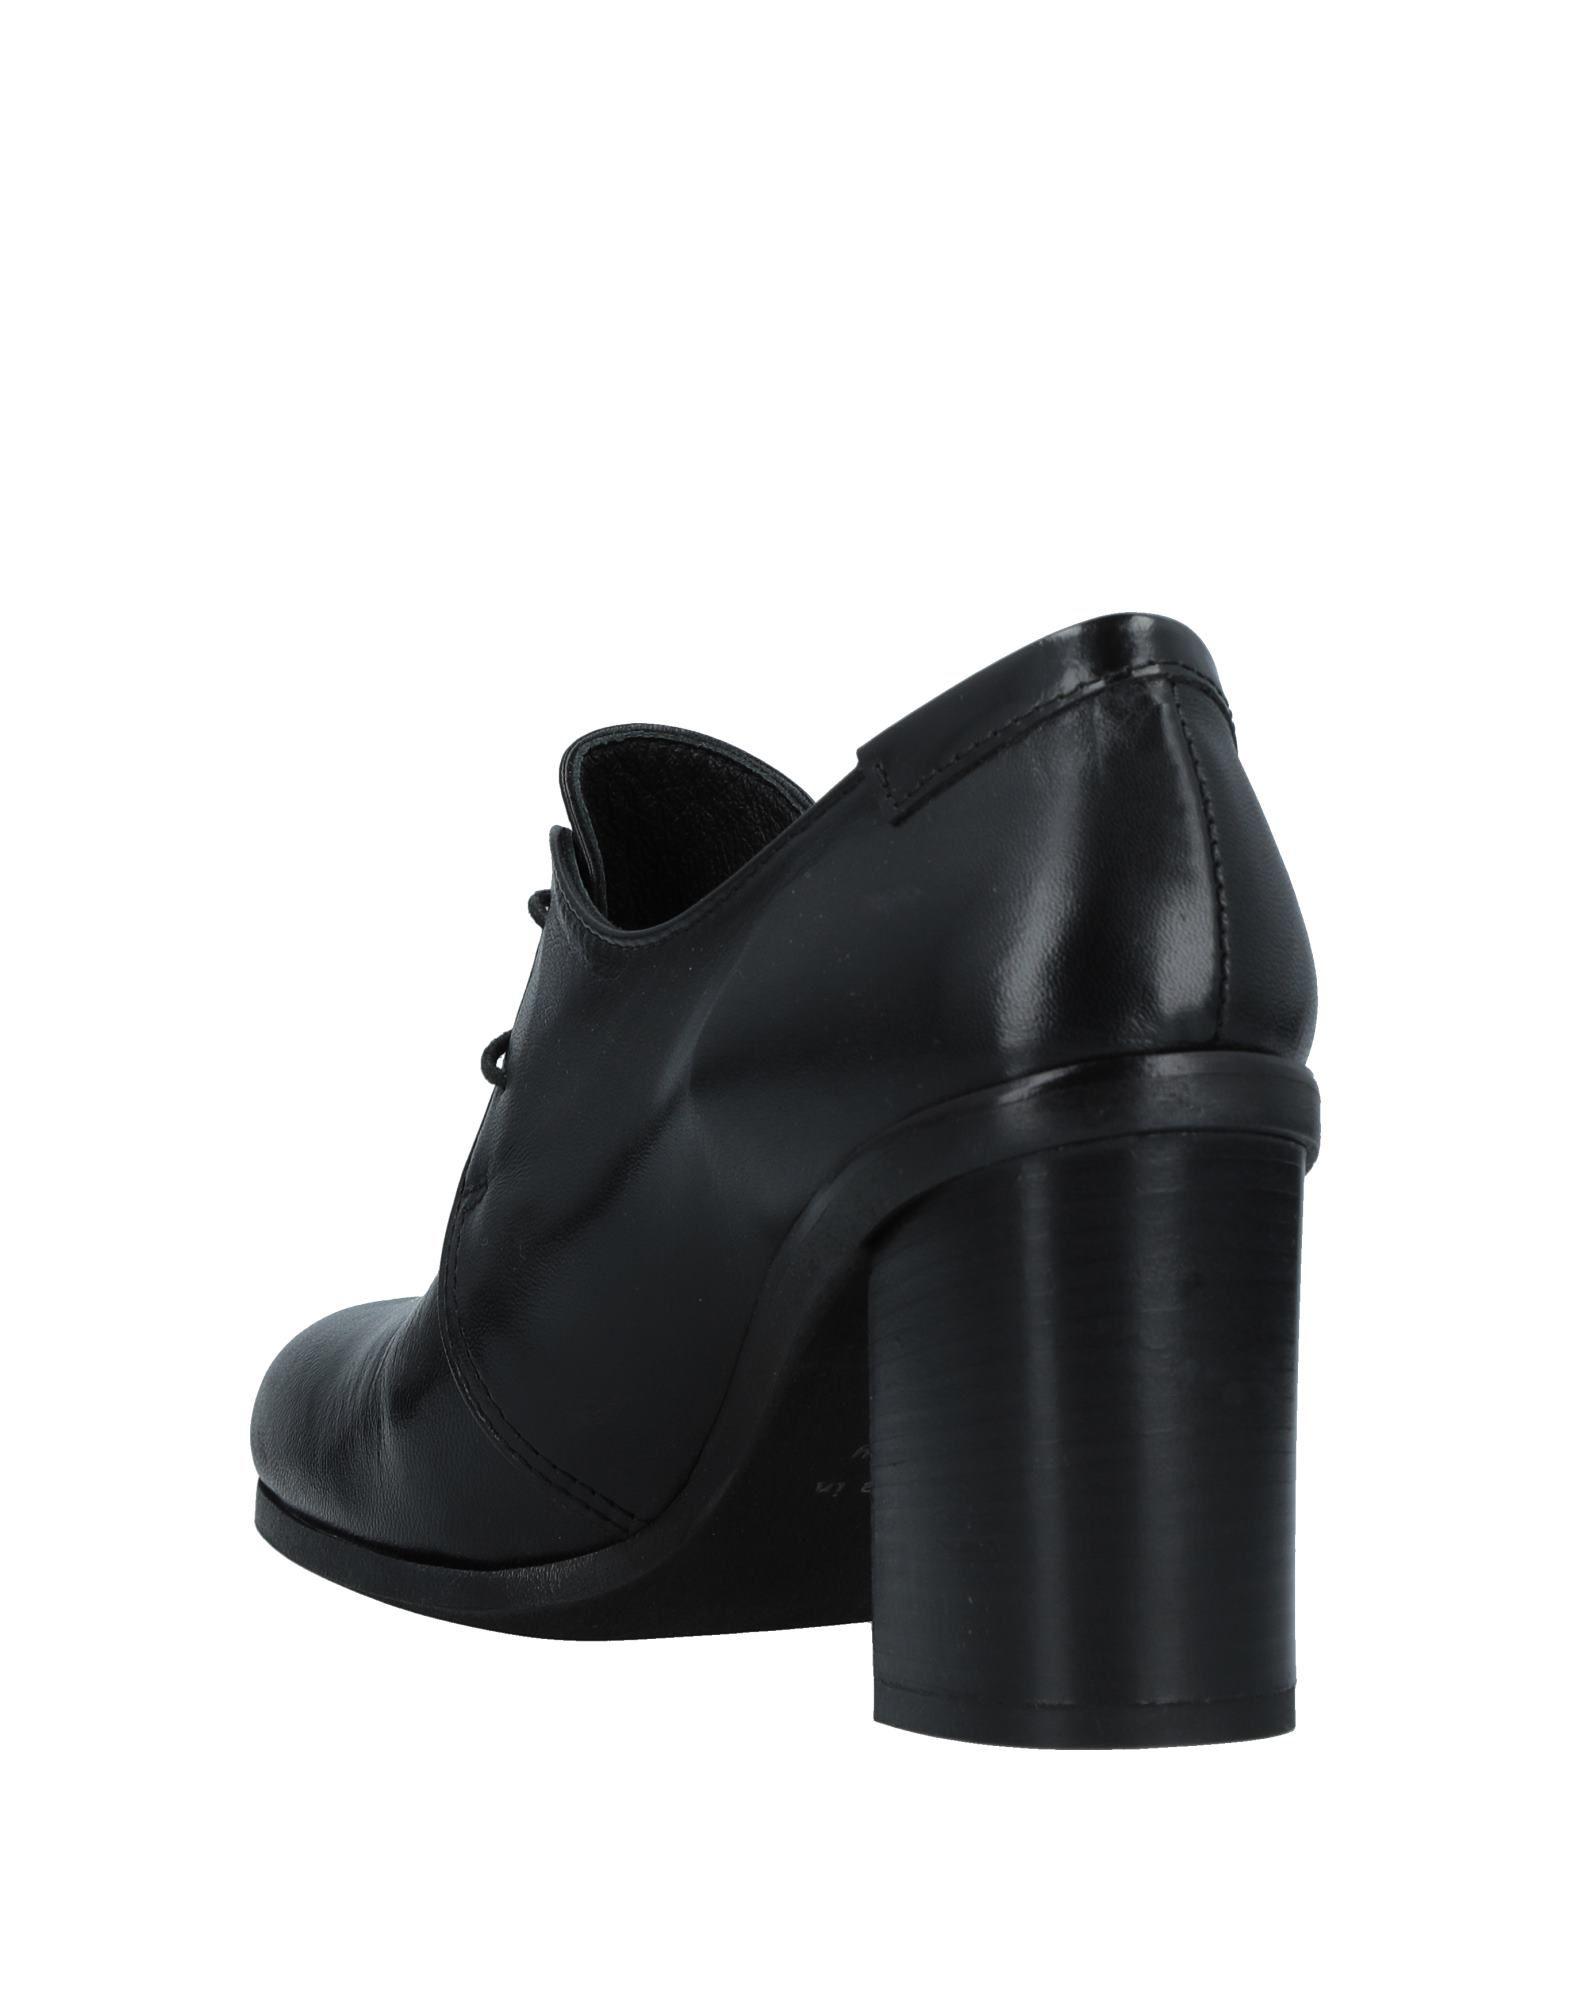 Lilimill Schnürschuhe Damen  11523963WW Qualität Gute Qualität 11523963WW beliebte Schuhe e4c99f